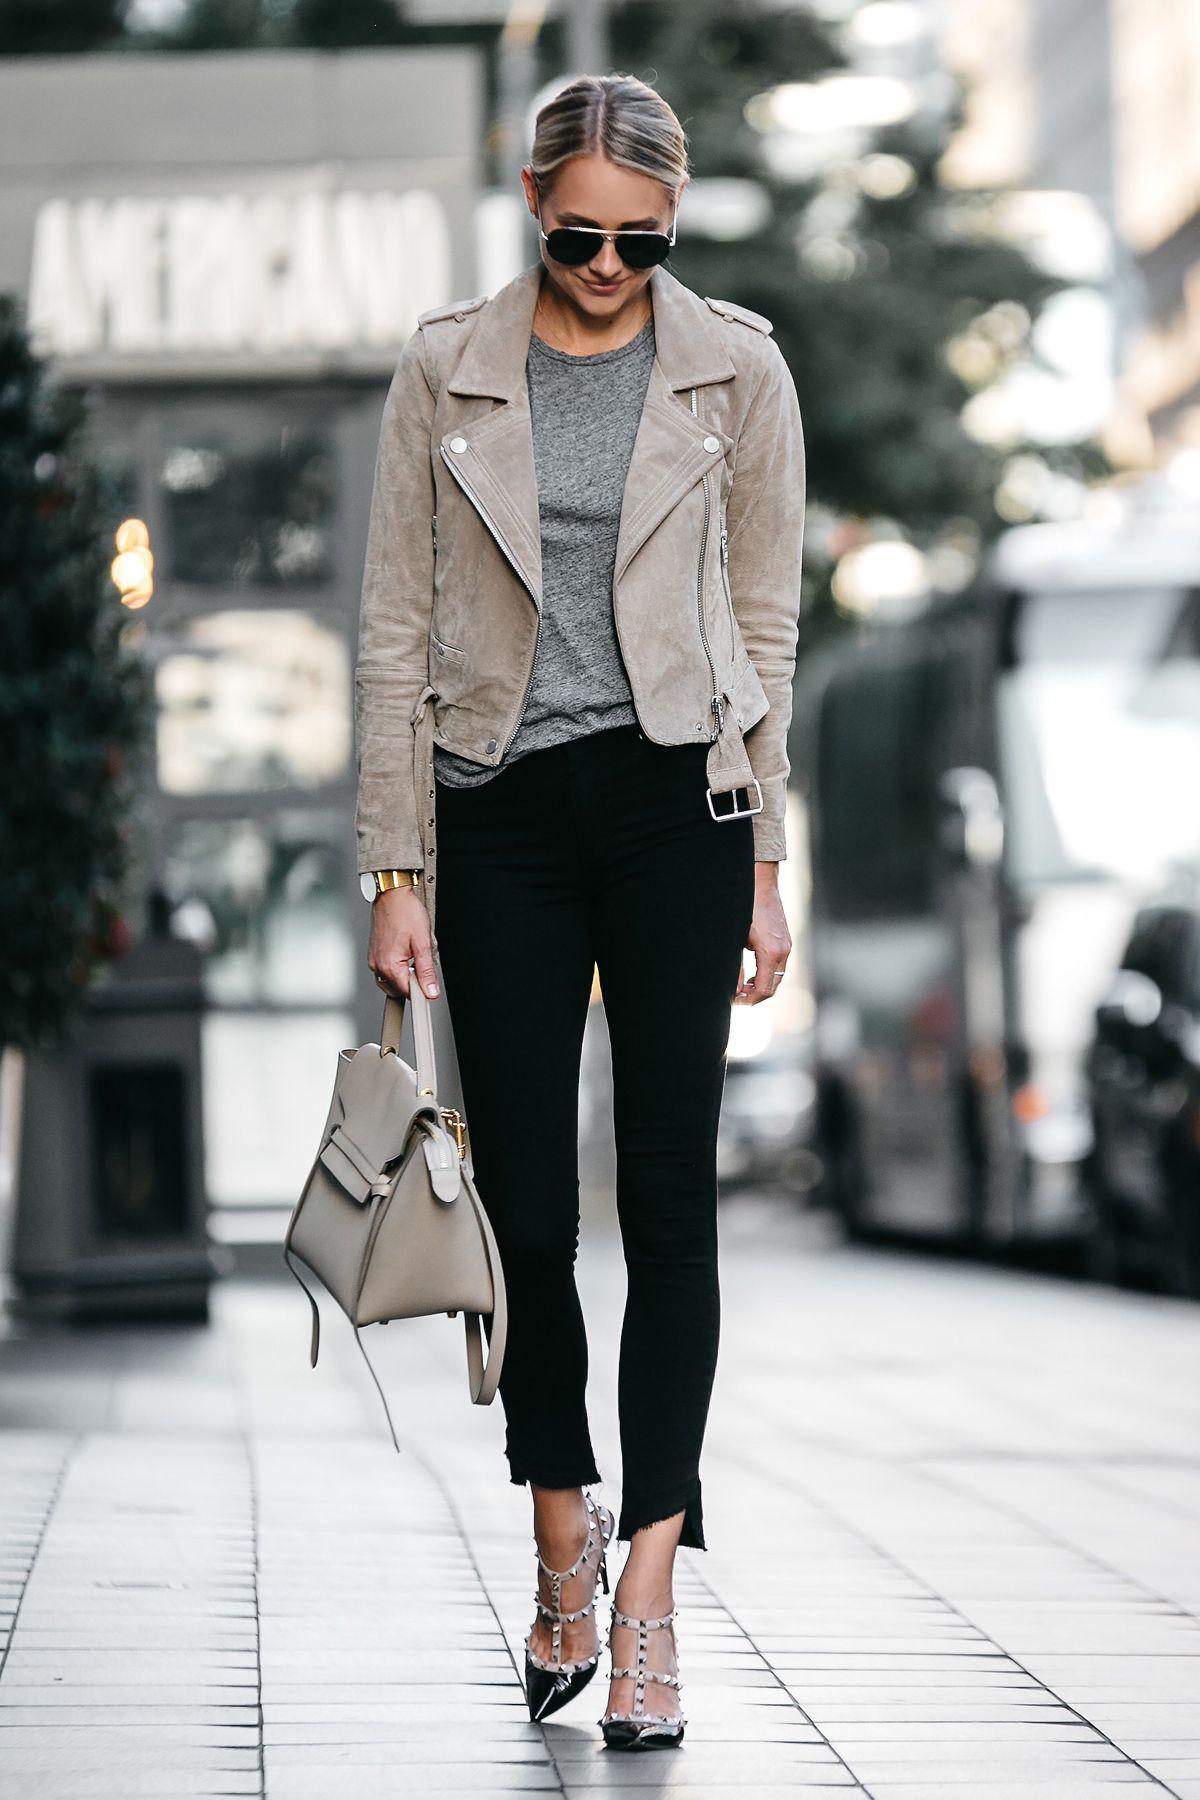 836c1328d7b Blonde Woman Wearing Blanknyc Tan Suede Moto Jacket Grey Tshirt Black  Skinny Jeans Outfit Valentino Rockstud Pumps Celine Belt Bag Fashion  Jackson Dallas ...